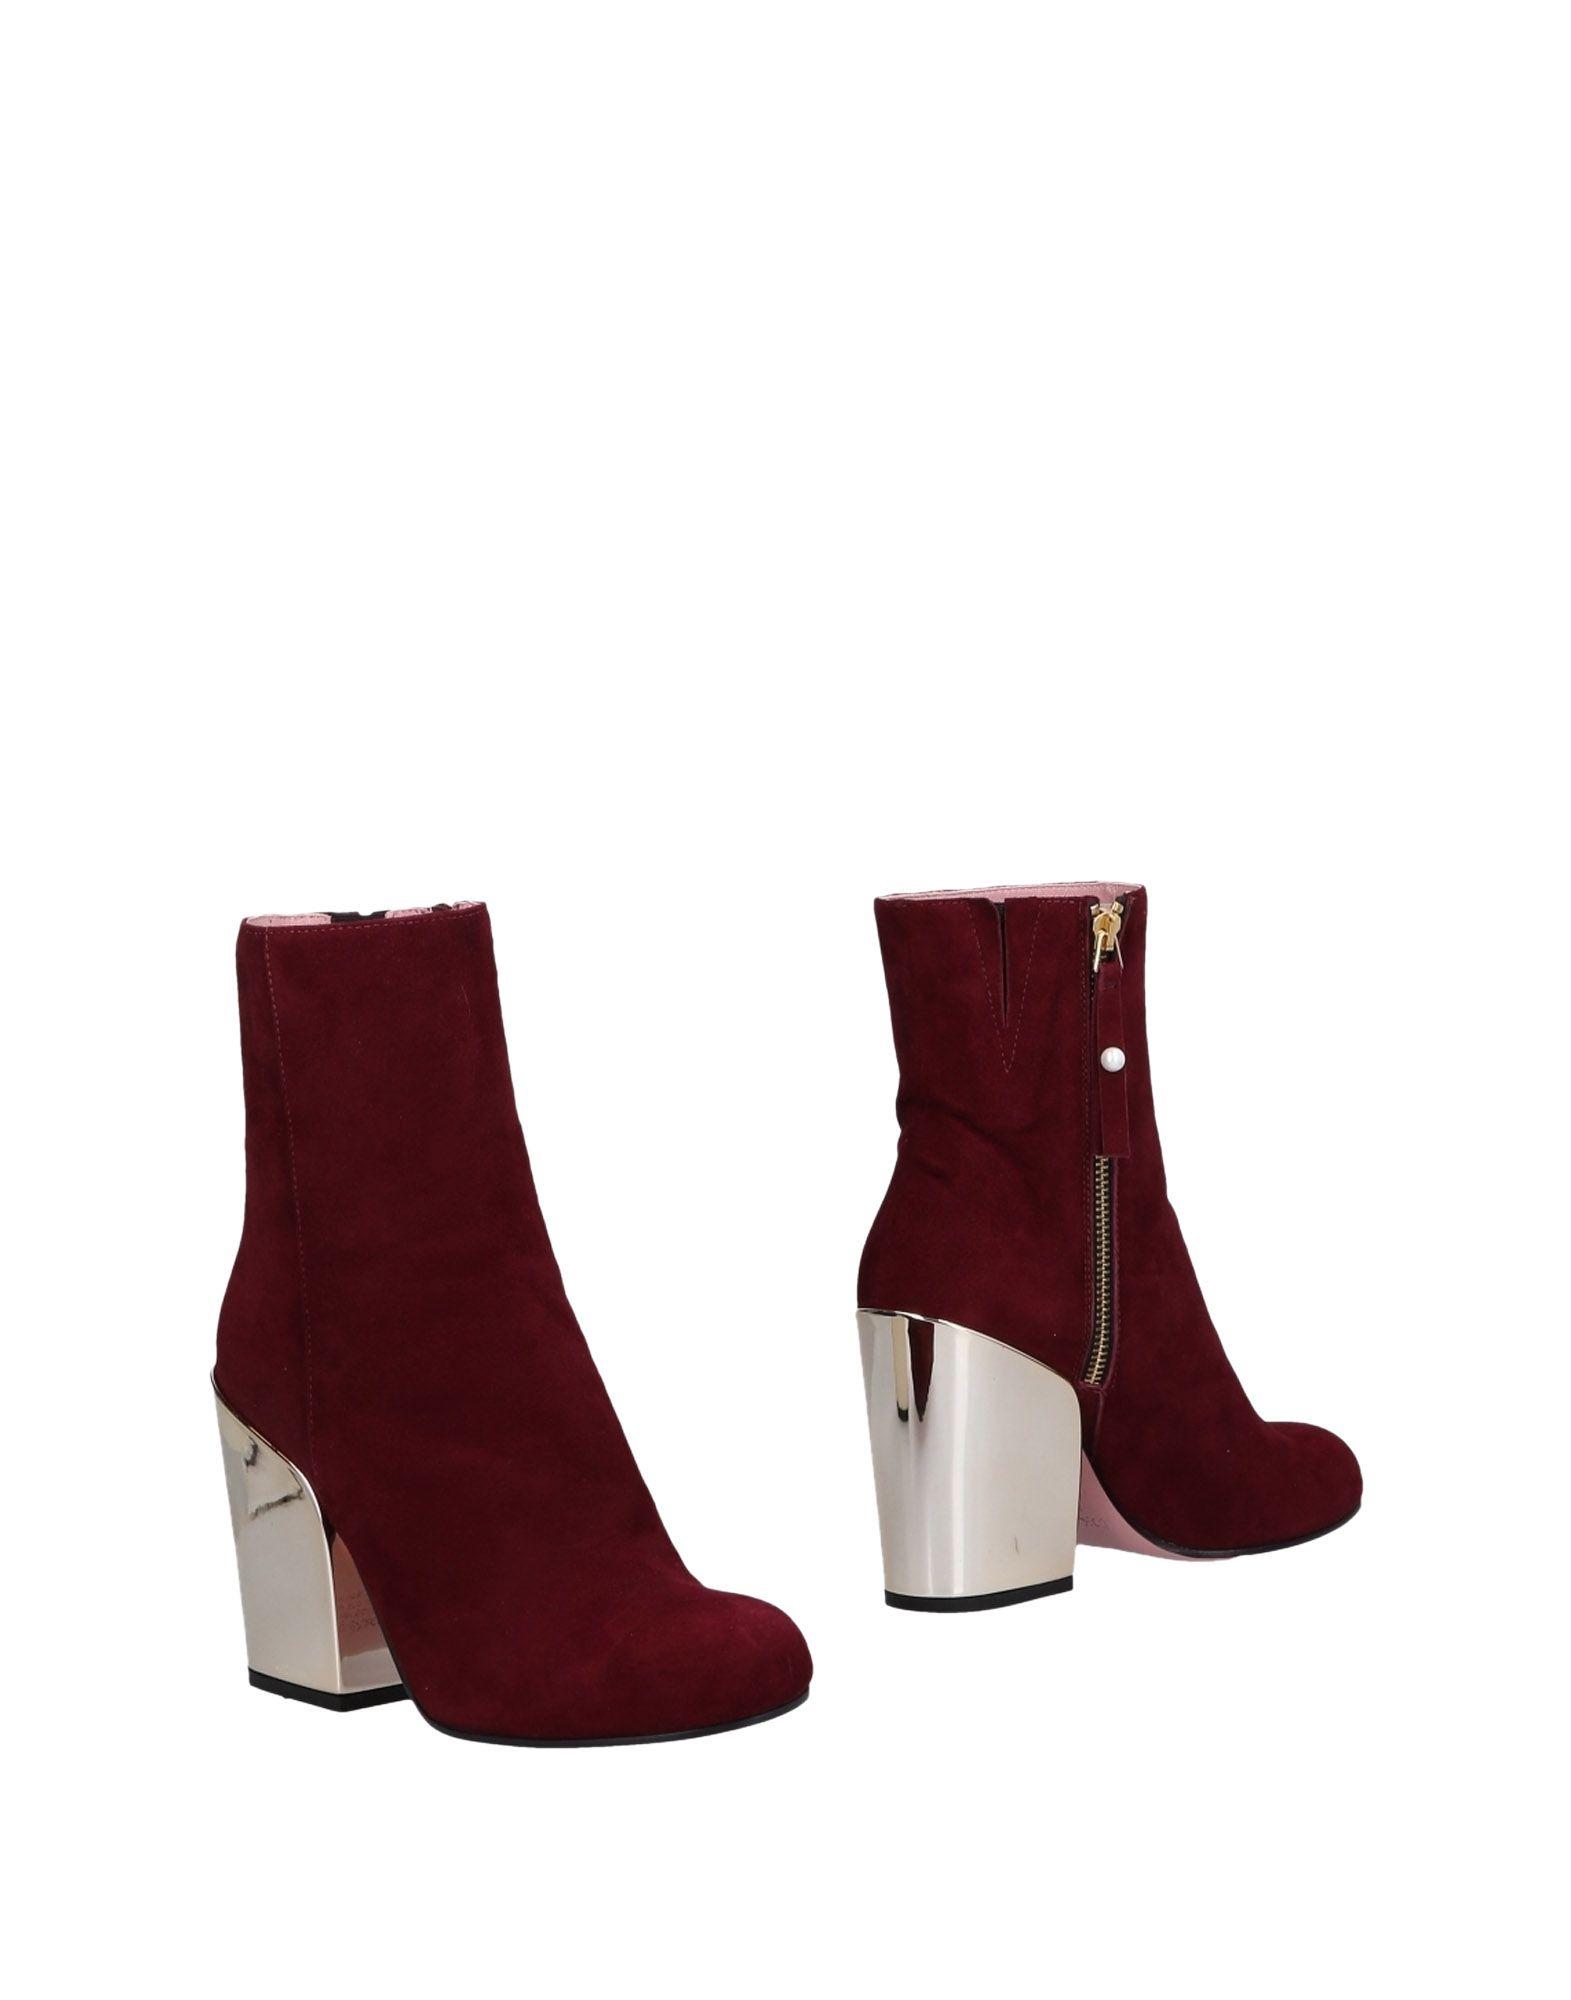 Tipe Stiefelette E Tacchi Stiefelette Tipe Damen  11472048DU Neue Schuhe dffbd2